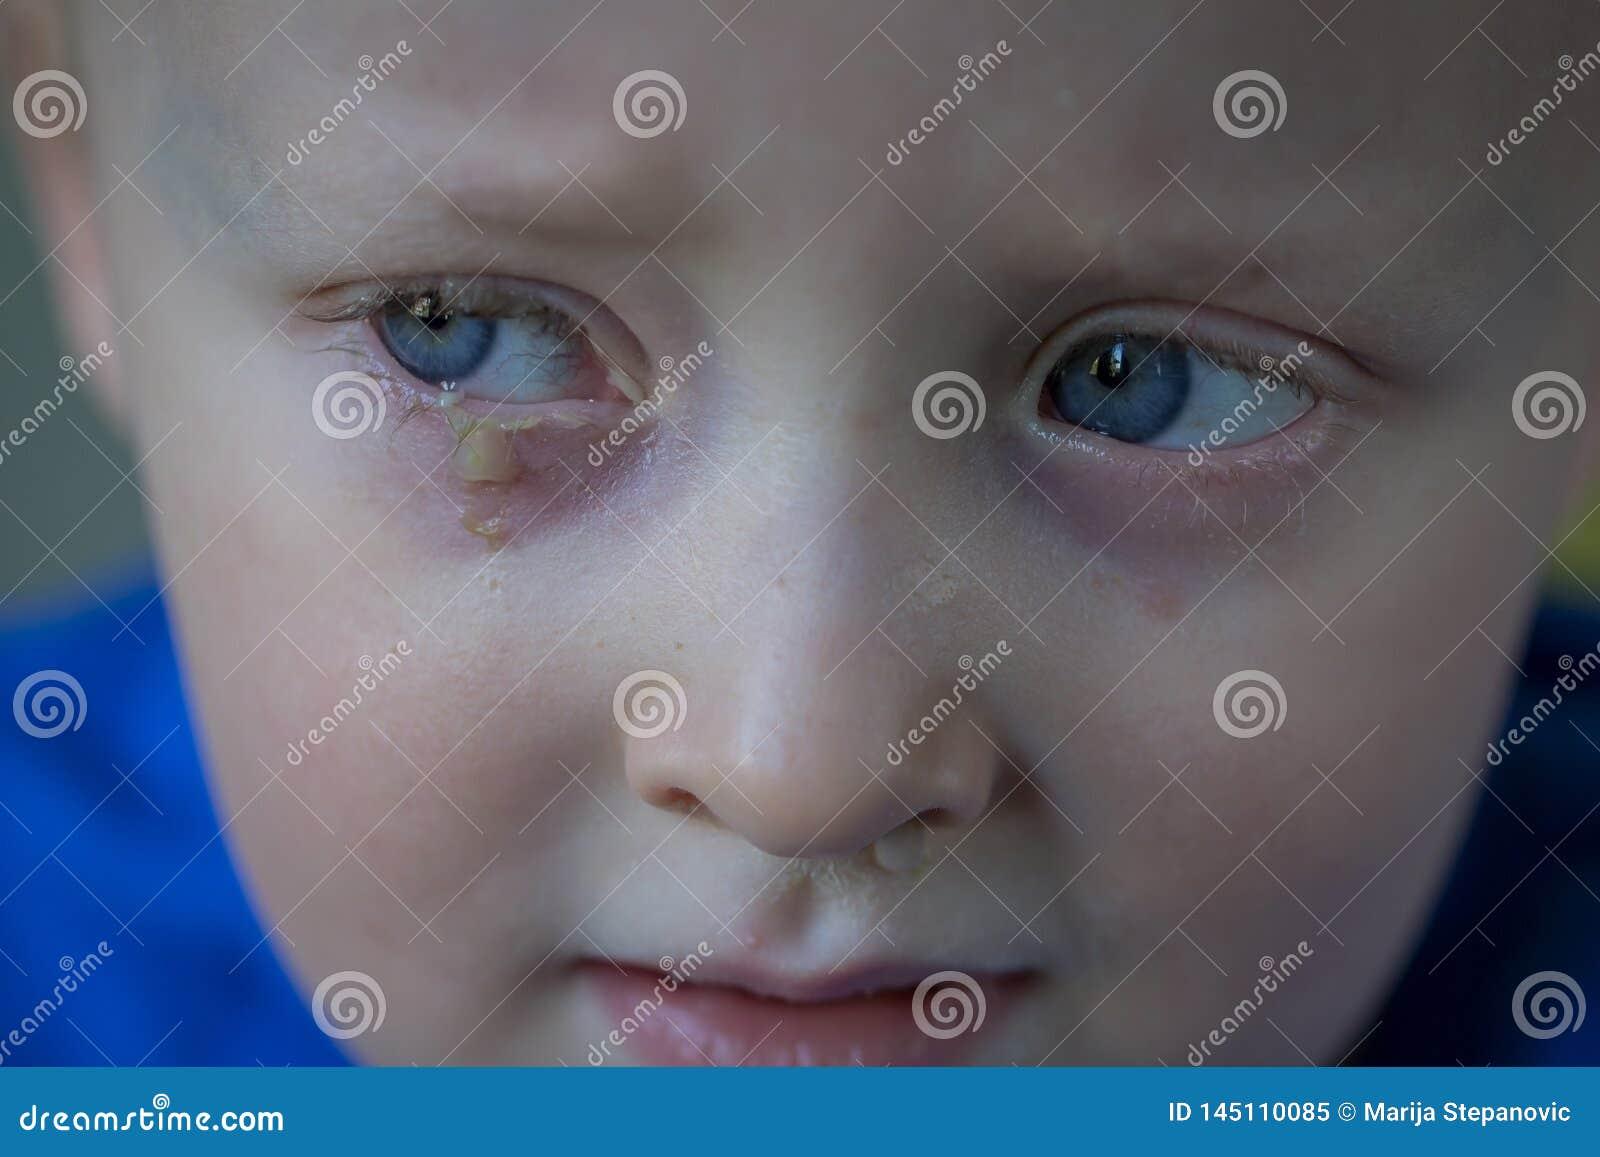 Kind met etterende bindvliesontsteking, besmettelijke oogbesmetting Symptomen en behandelingsconcept Sluit omhoog